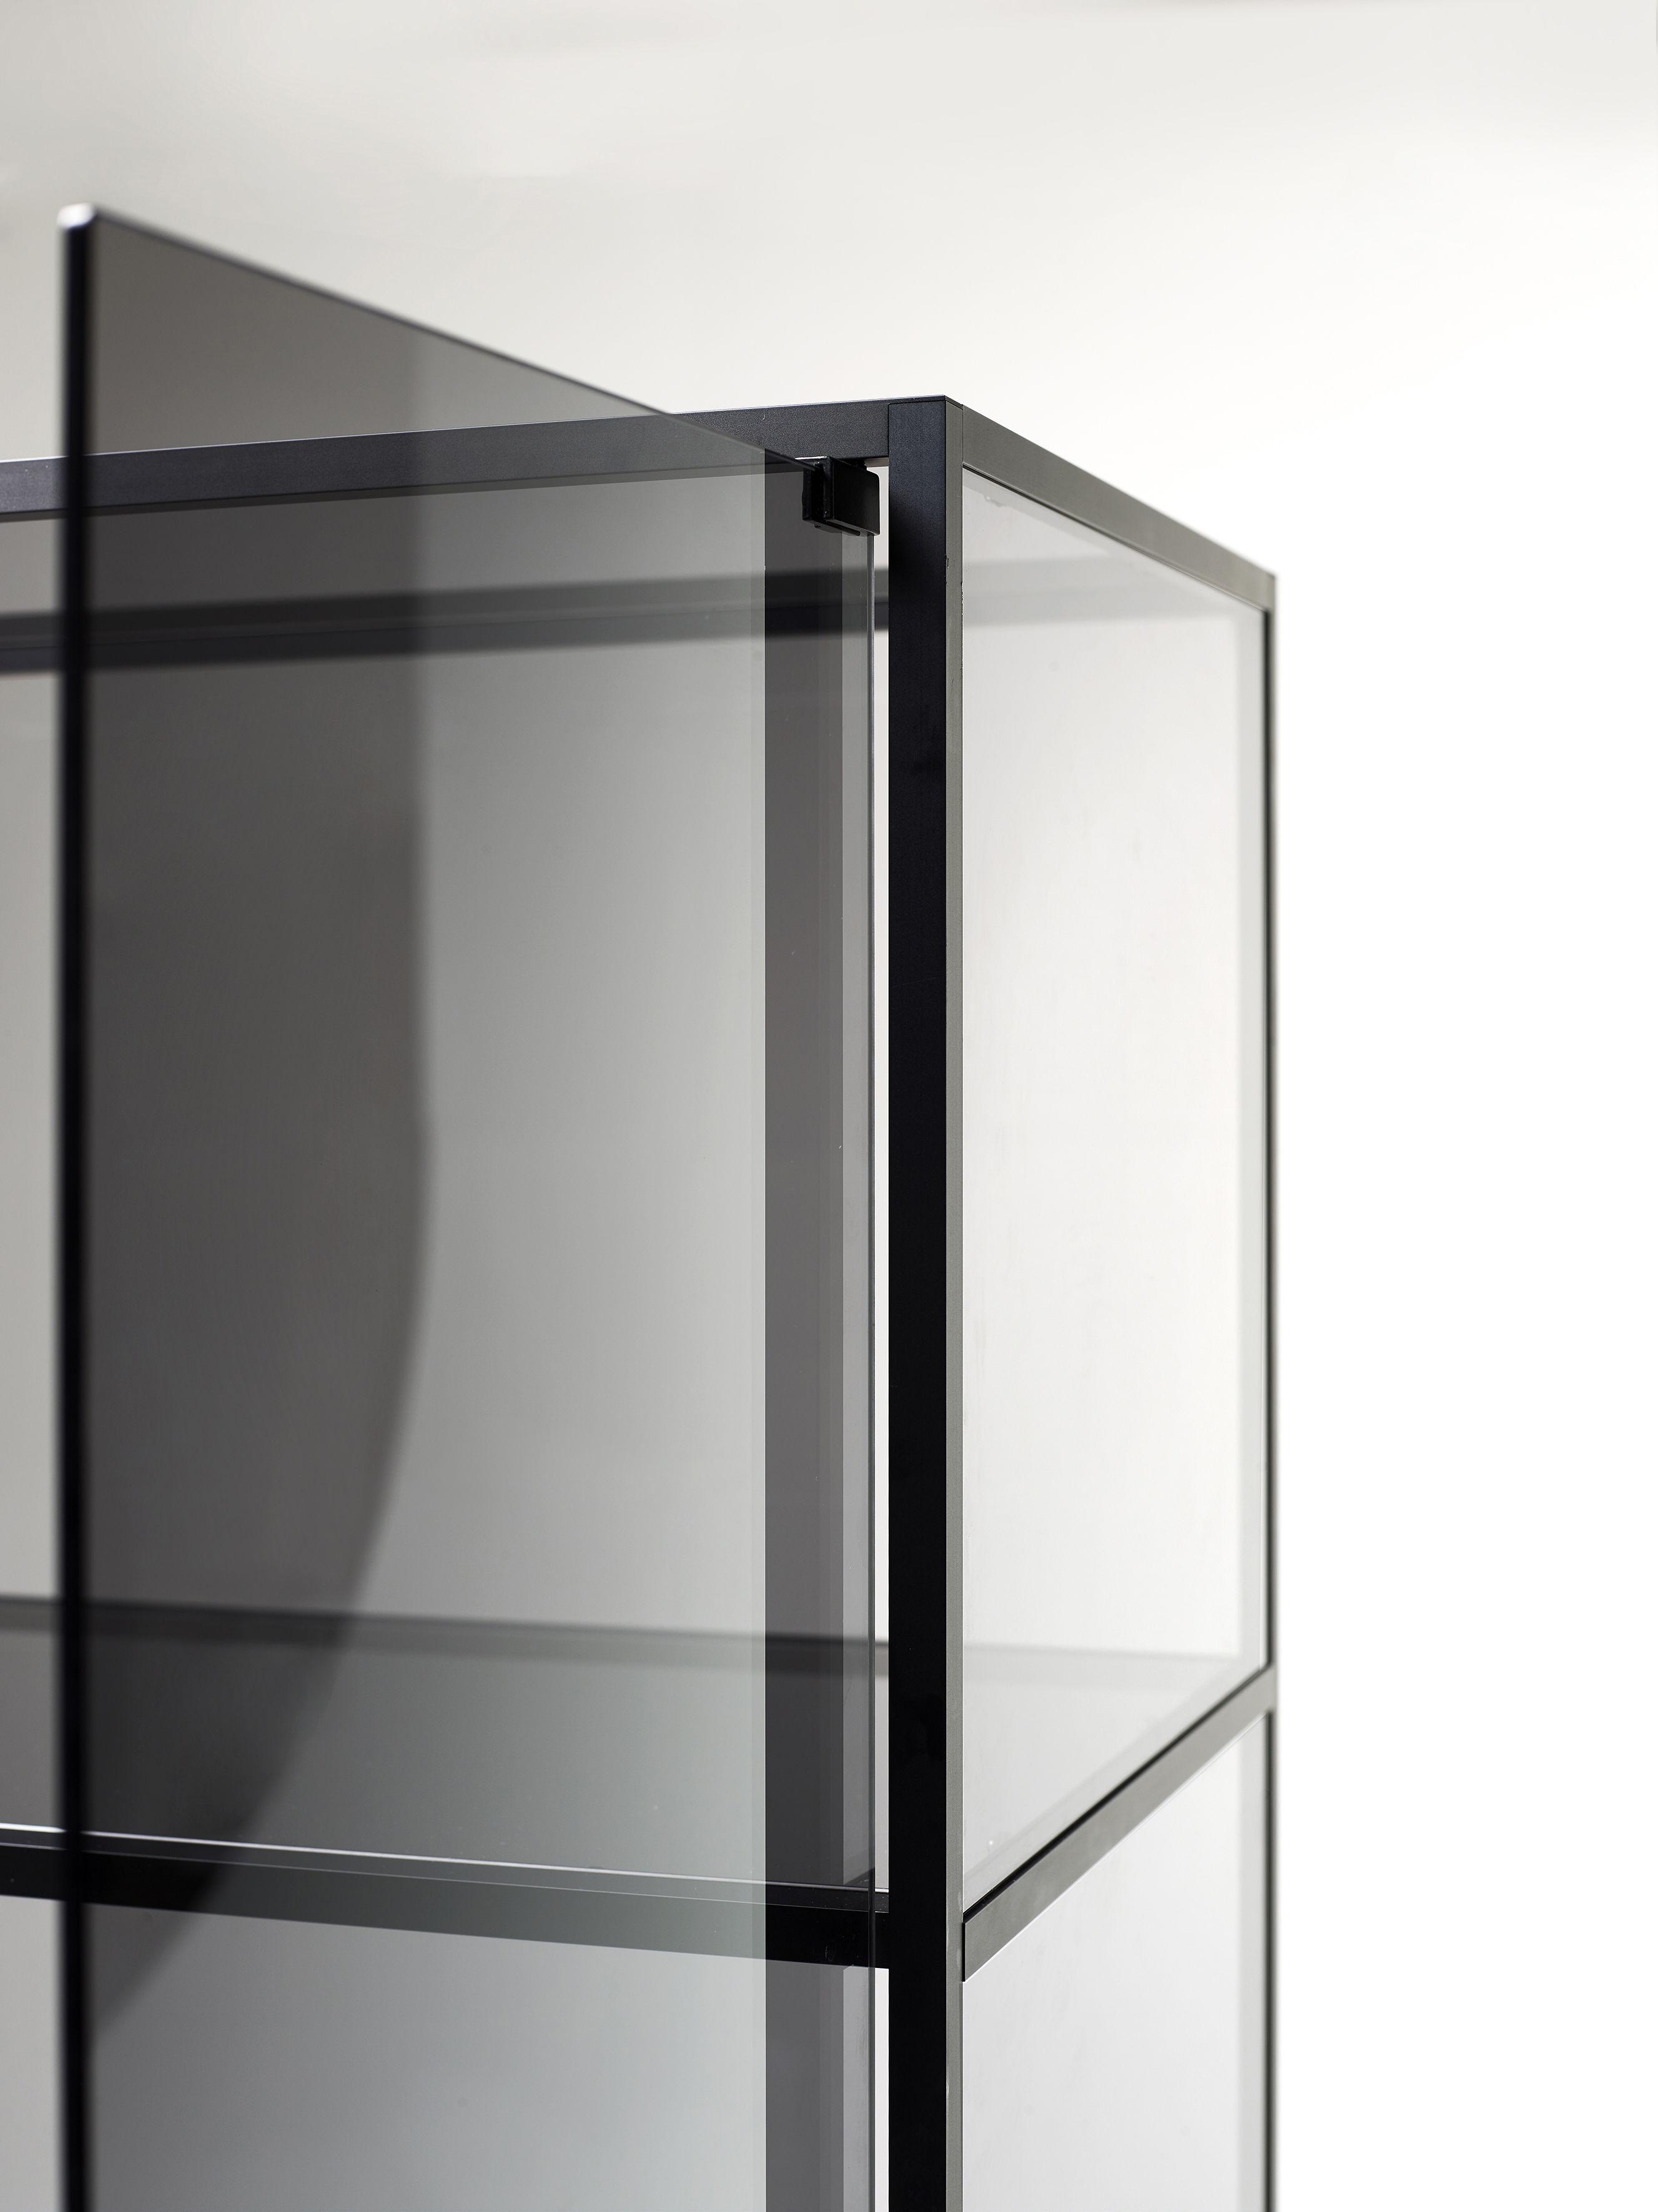 Meuble de rangement yang vitrine h 180 cm noir verre fum opinion ciatti made in design - Meuble rangement verre ...